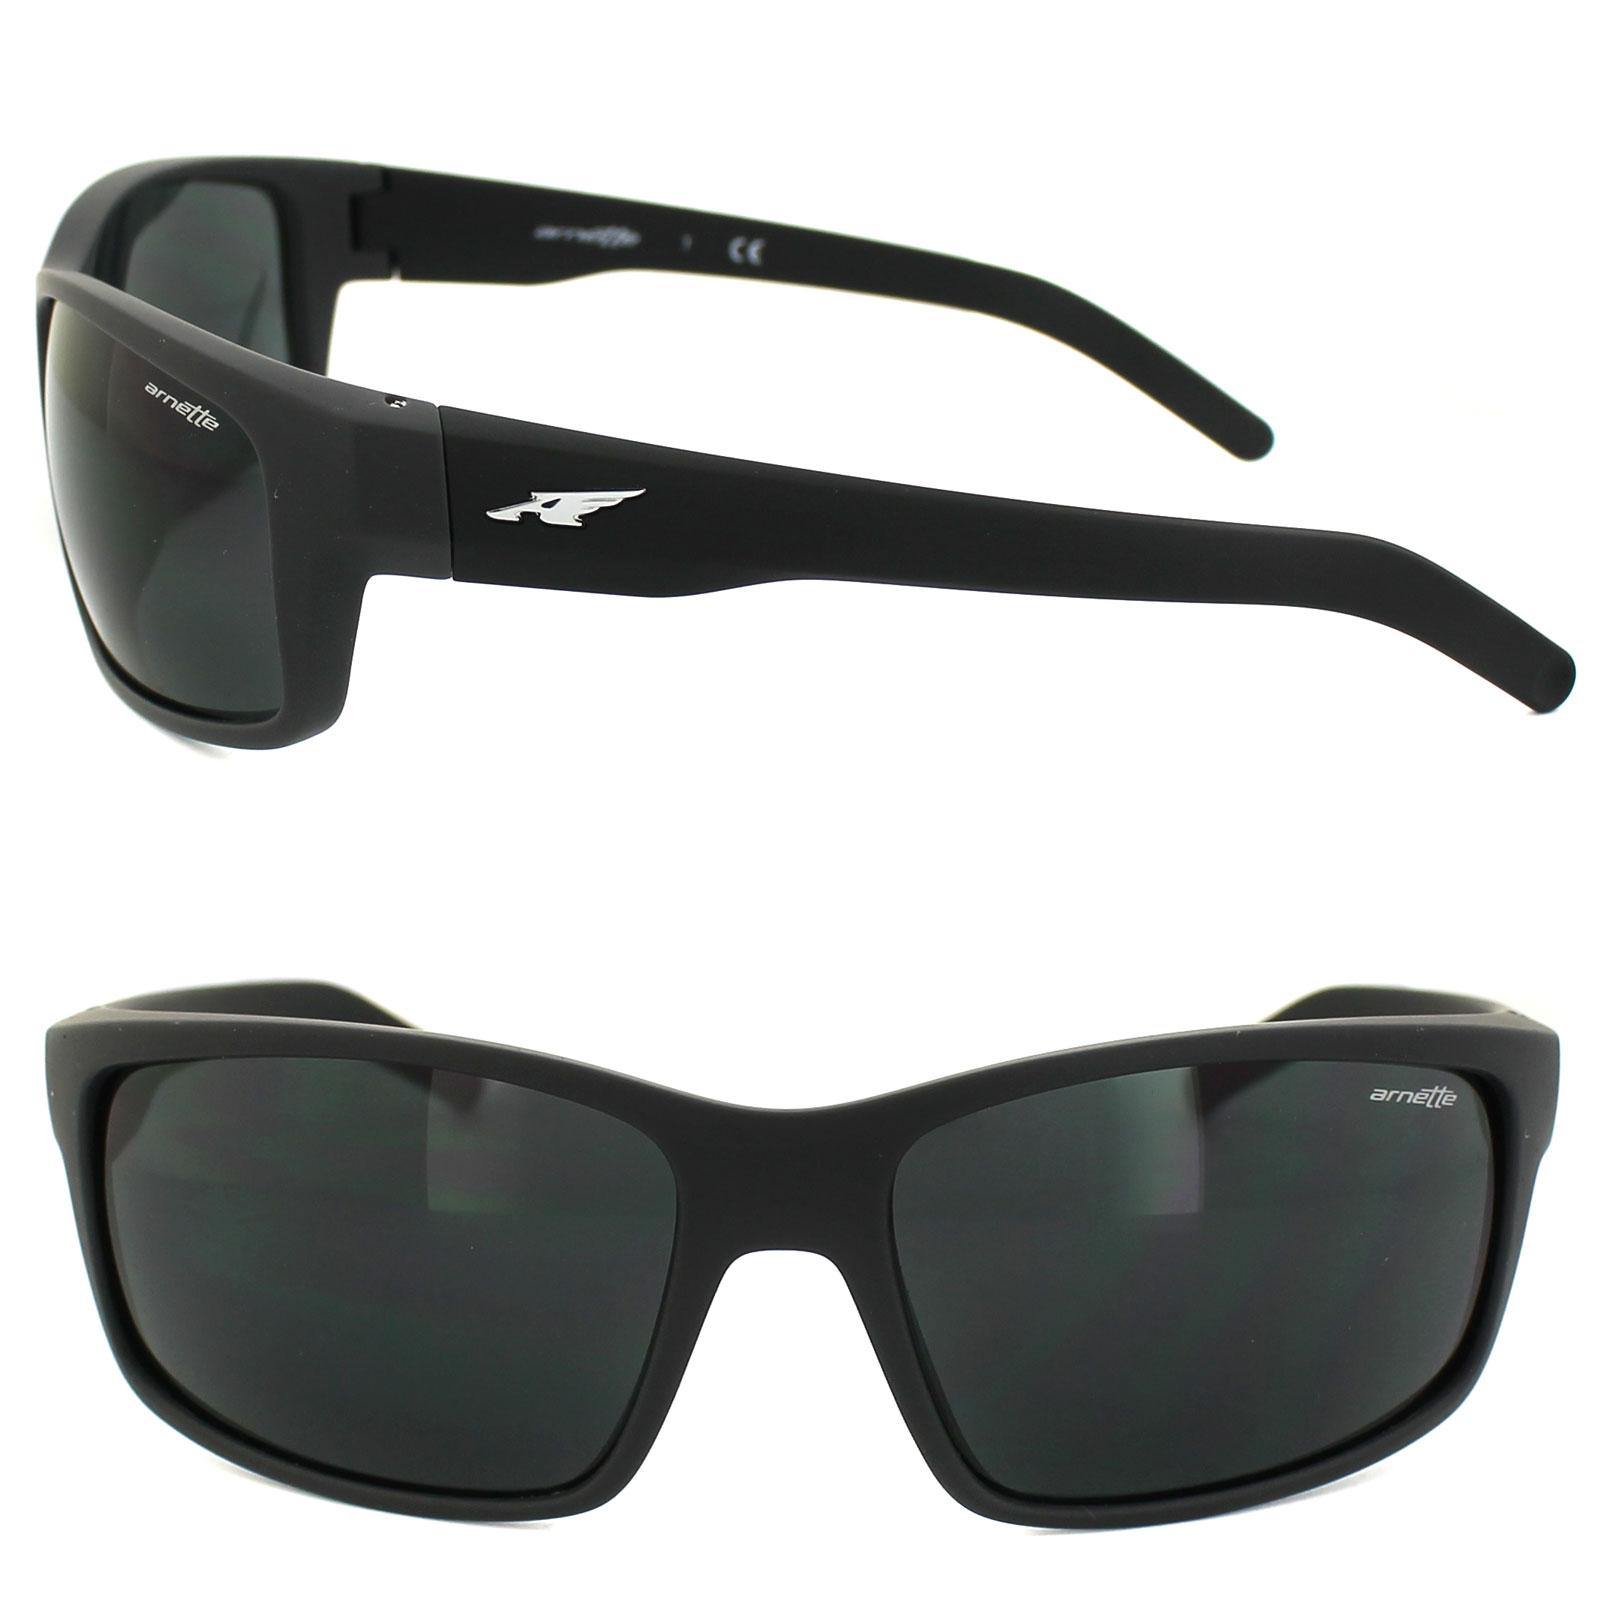 b113b281cd9 Sentinel Thumbnail 2. Sentinel Arnette Sunglasses 4202 Fastball 226687  Fuzzy Grey Grey